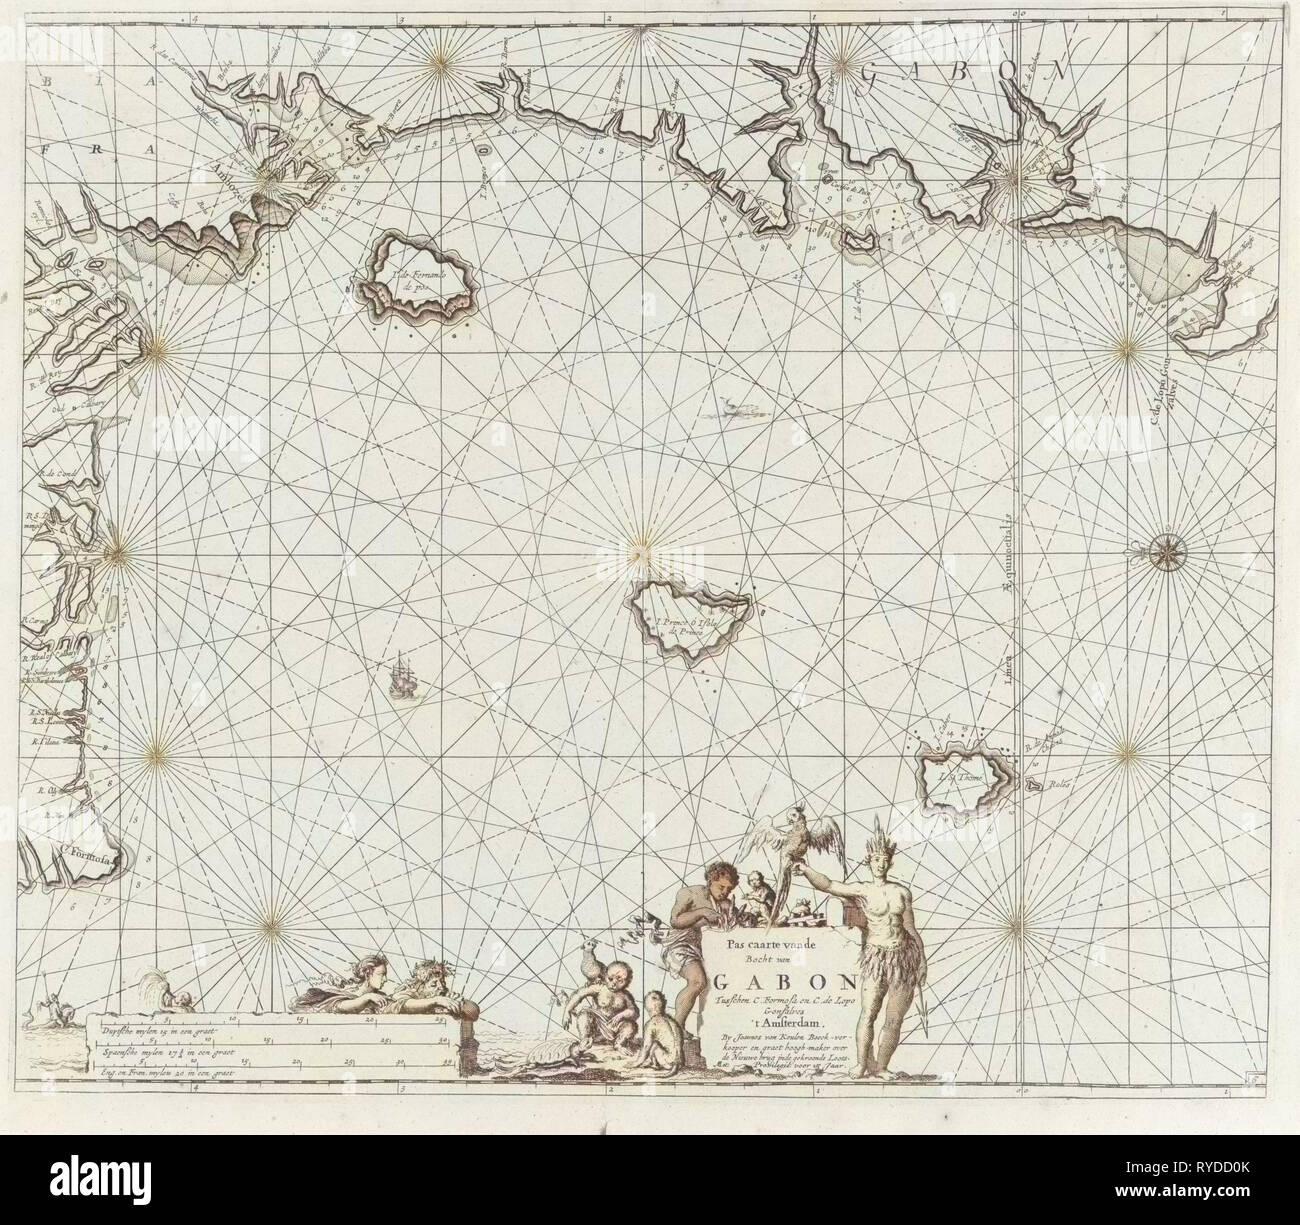 Sea chart of the coast of Equatorial Guinea, Gabon and Cameroon, print maker: Jan Luyken, Johannes van Keulen I, unknown, 1683 - 1799 - Stock Image